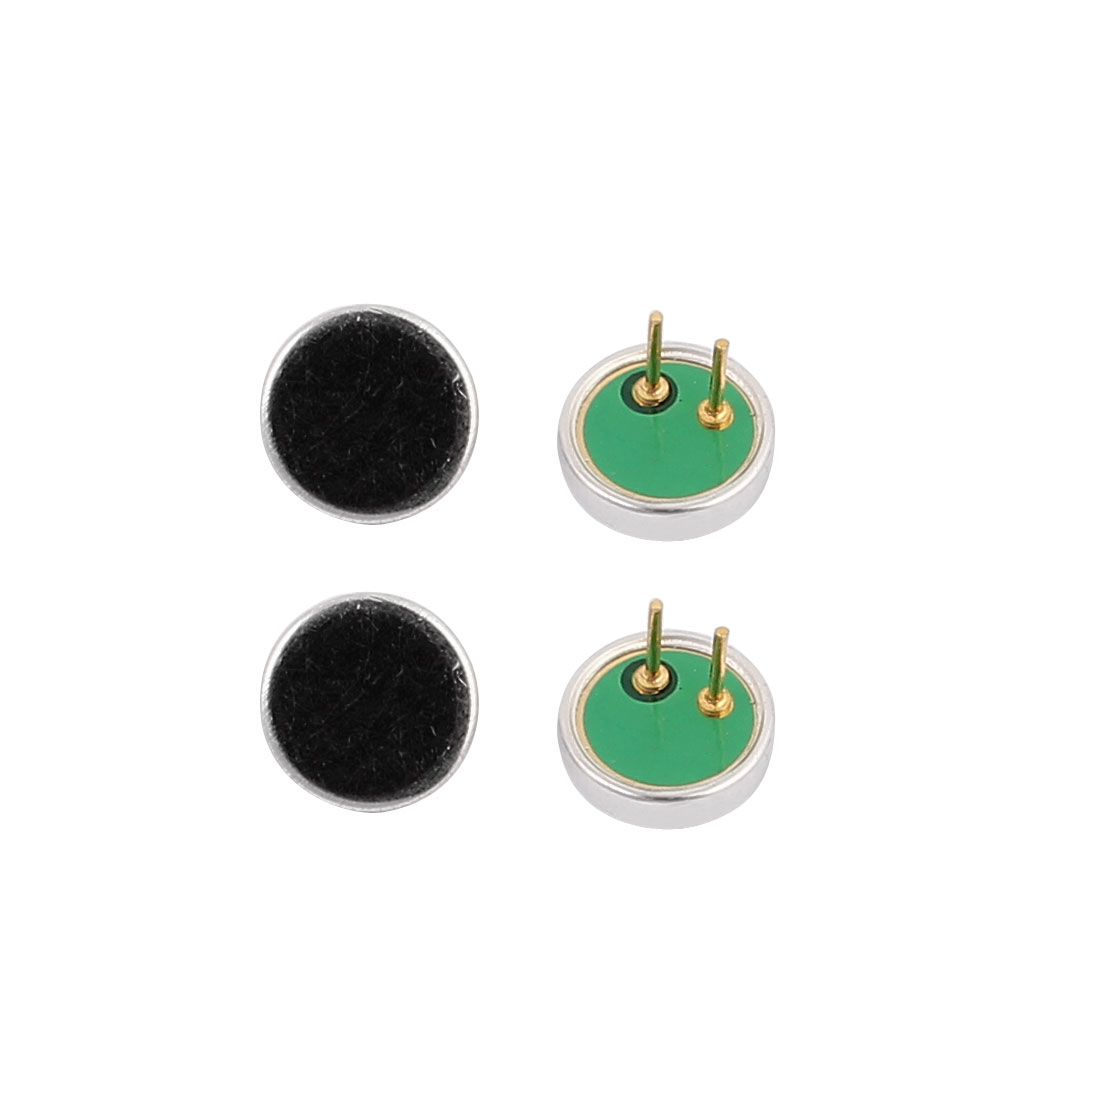 4pcs 6x1.8mm 30-40dB Electret Condenser Microphone High Sensitivity Pickup